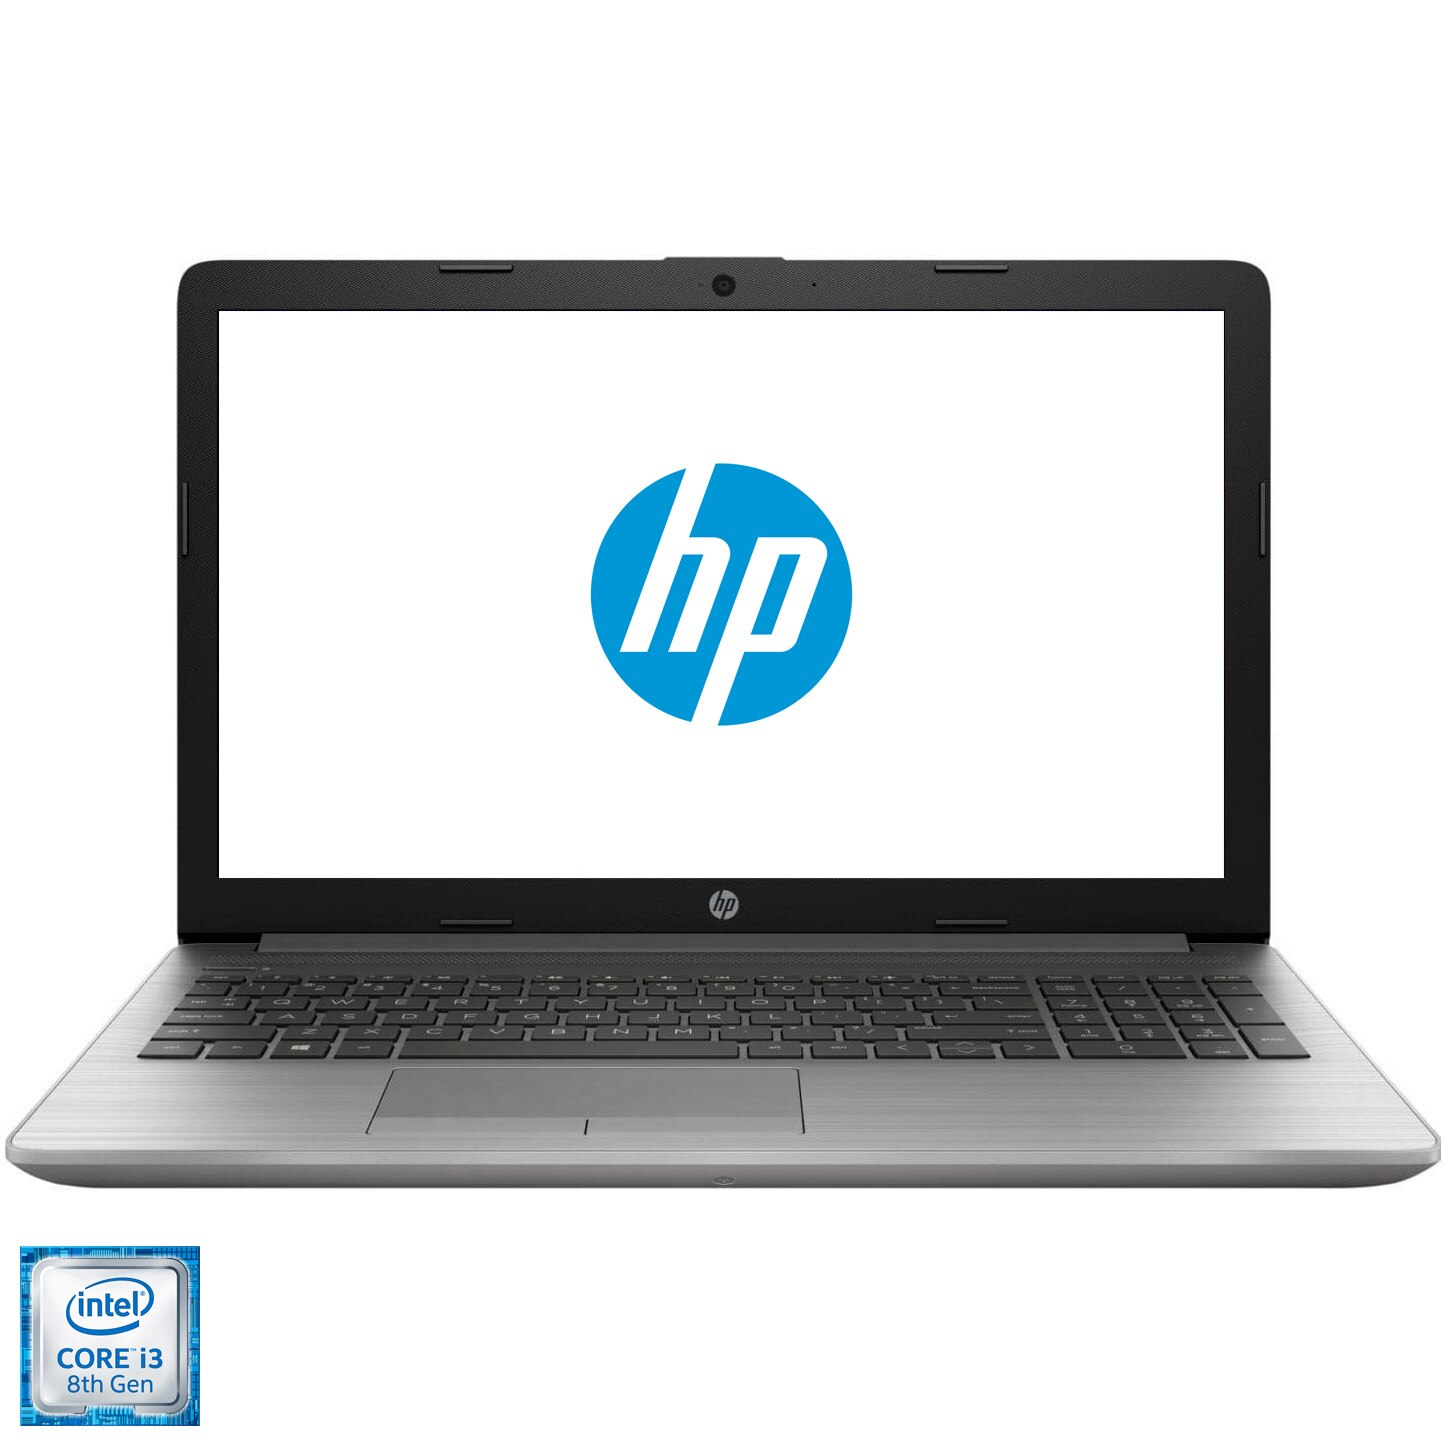 "Fotografie Laptop HP 250 G7 cu procesor Intel(r) Core(tm) i3-8130U pana la 3.40 GHz Kaby Lake, 15.6"", Full HD, 4GB, 1TB HDD, DVD-RW, Intel UHD Graphics, Free DOS, Silver"